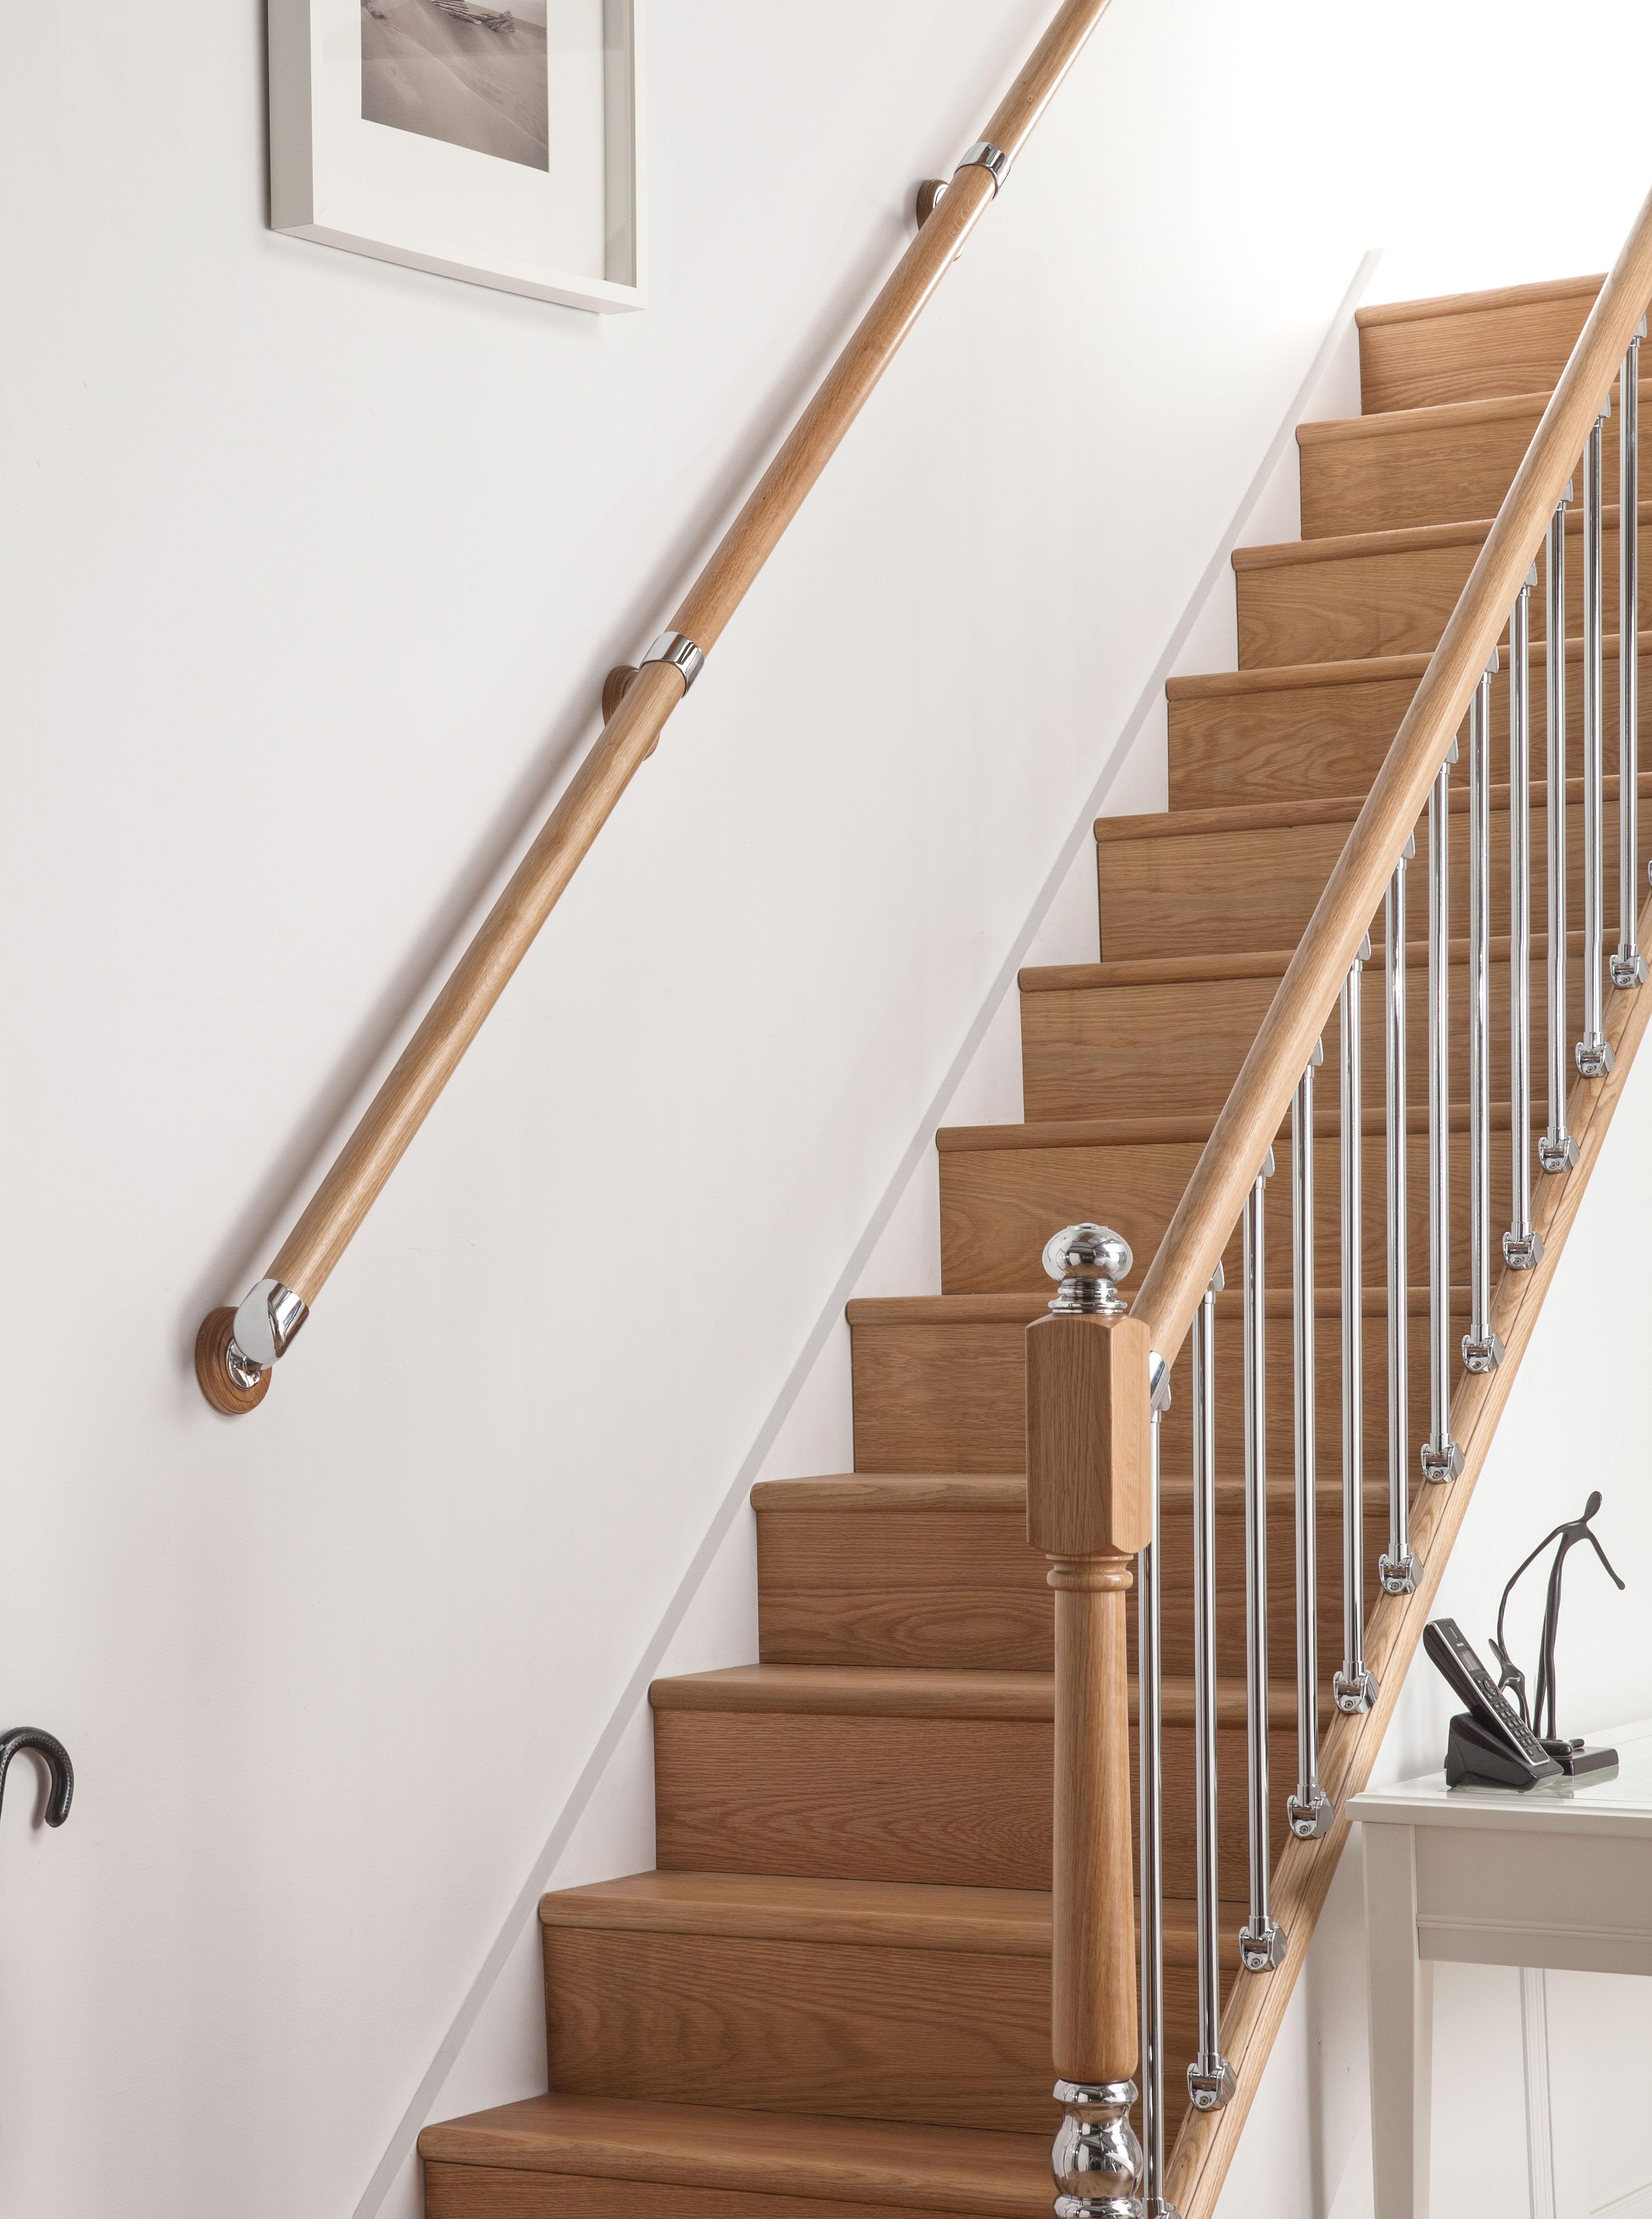 Ays Wall Handrail Kit 4mts Rail In Box Set Oak And Chrome Stair Image